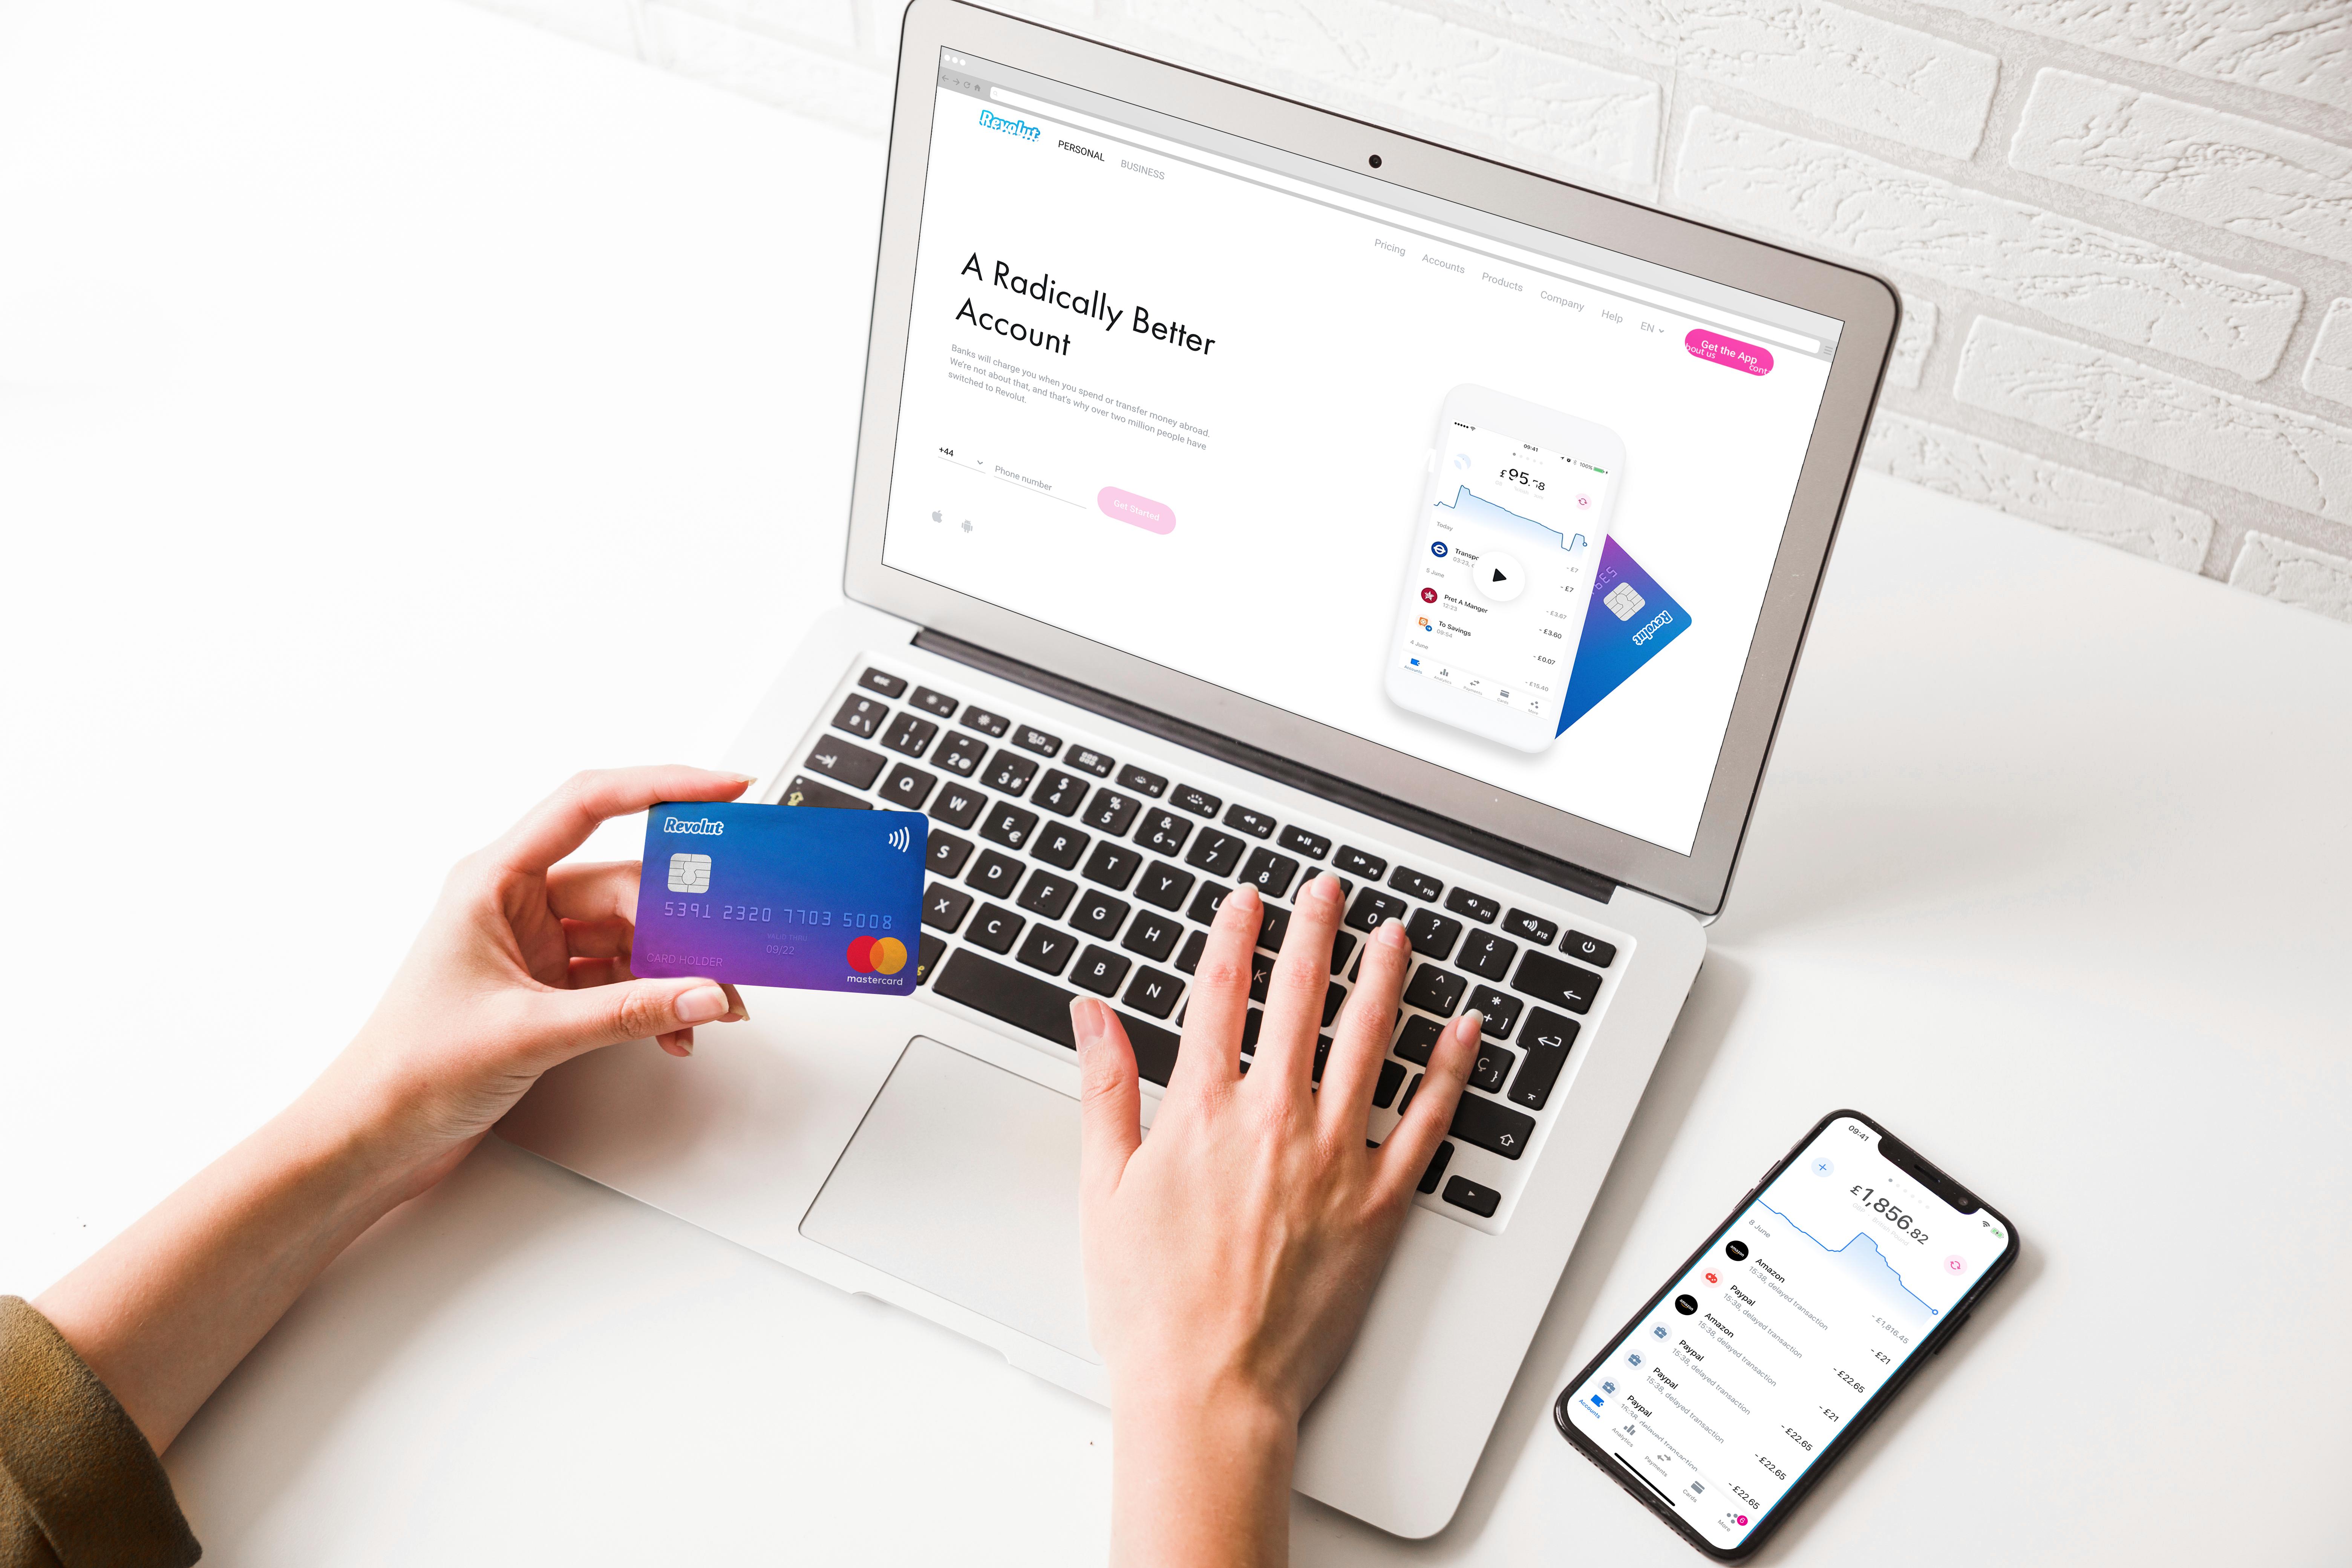 Revolut reveals Mastercard tie-up for US debit card launch